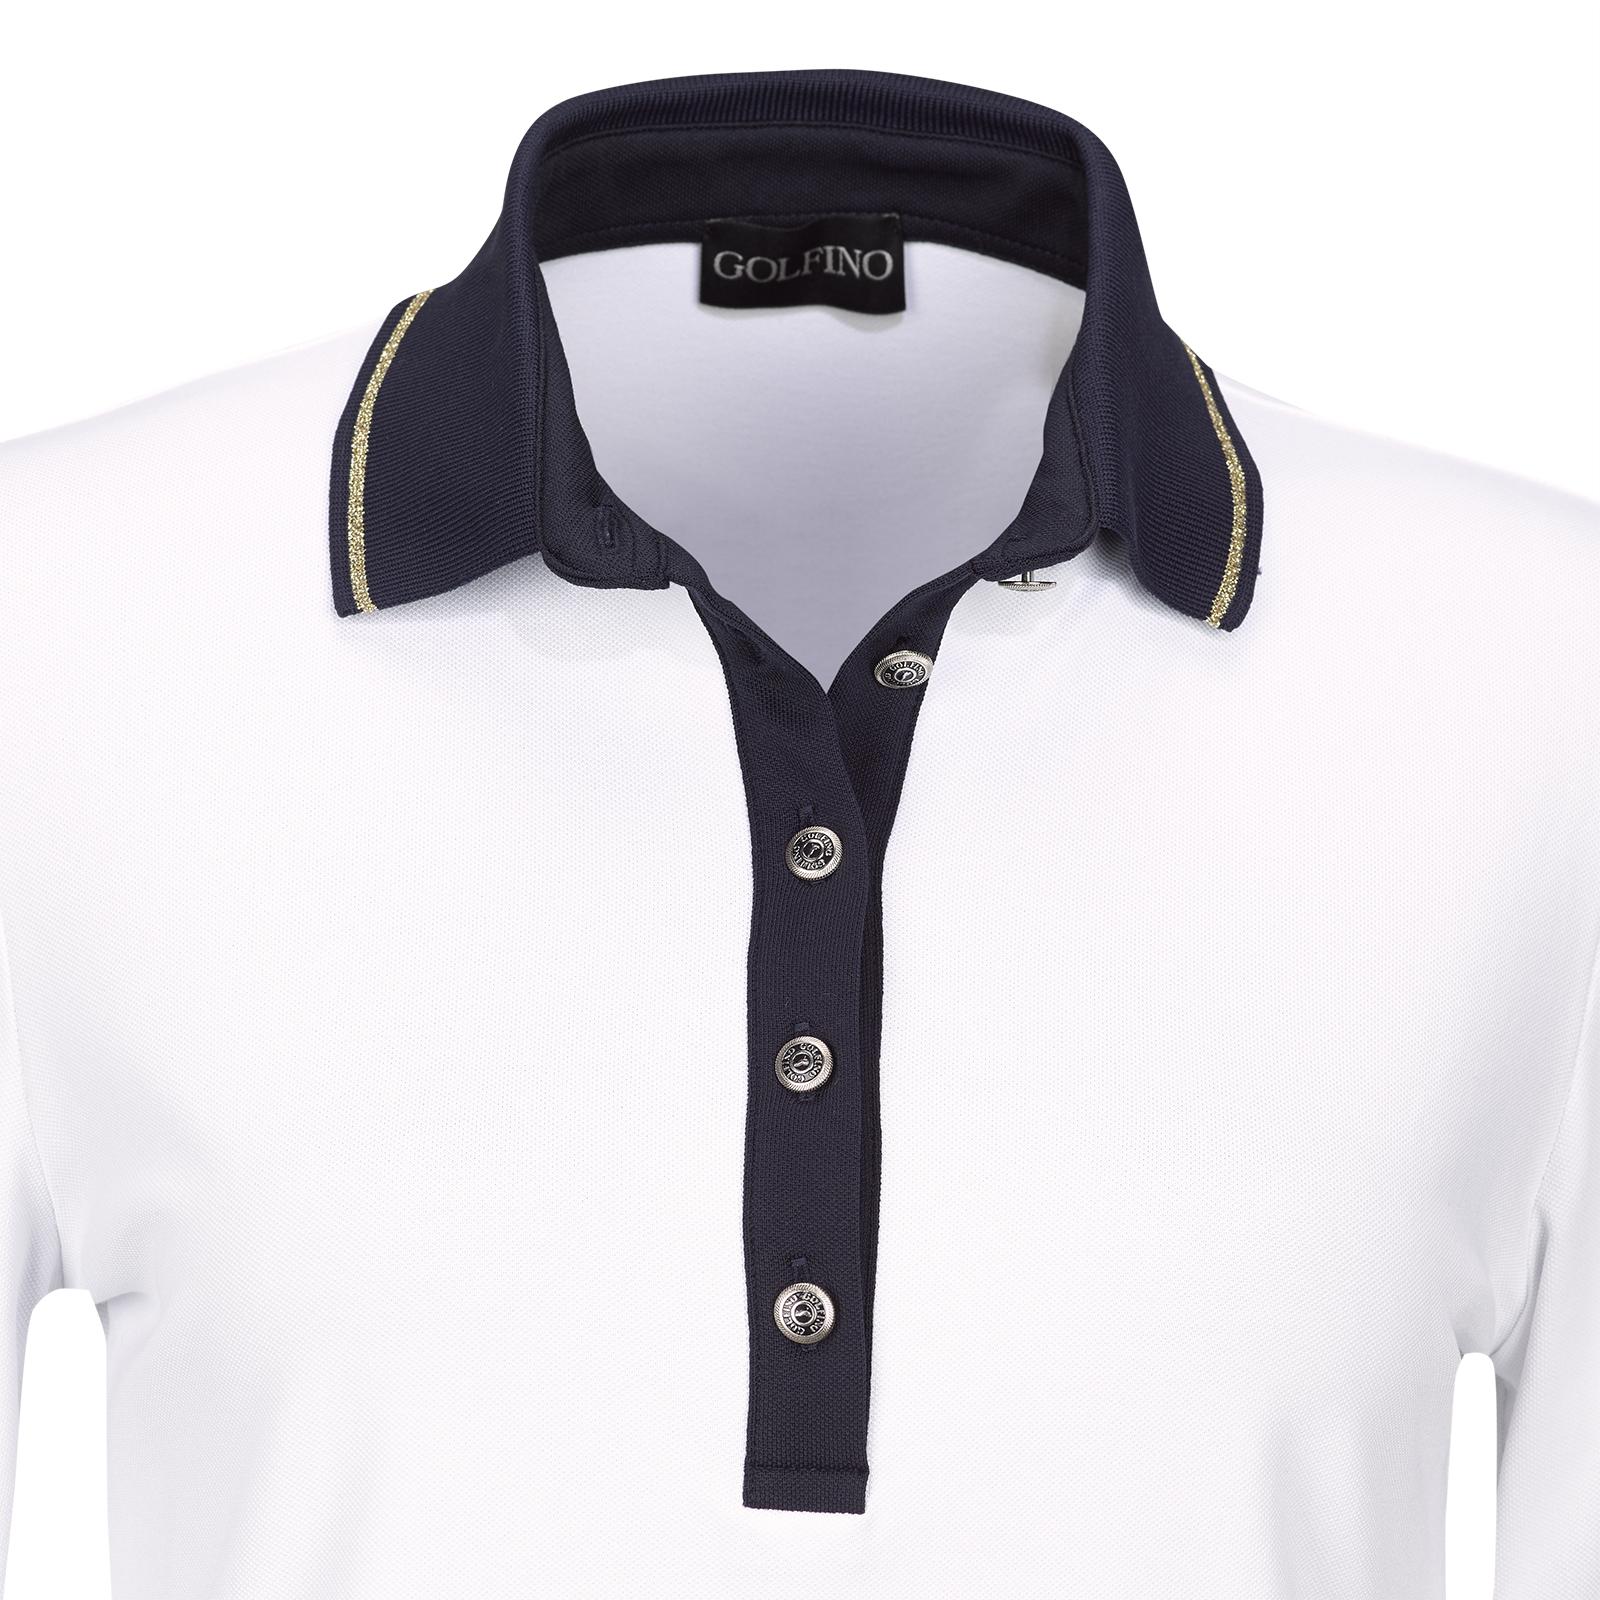 Premium Casual Langarm Damen Golfpolo mit Sun Protection